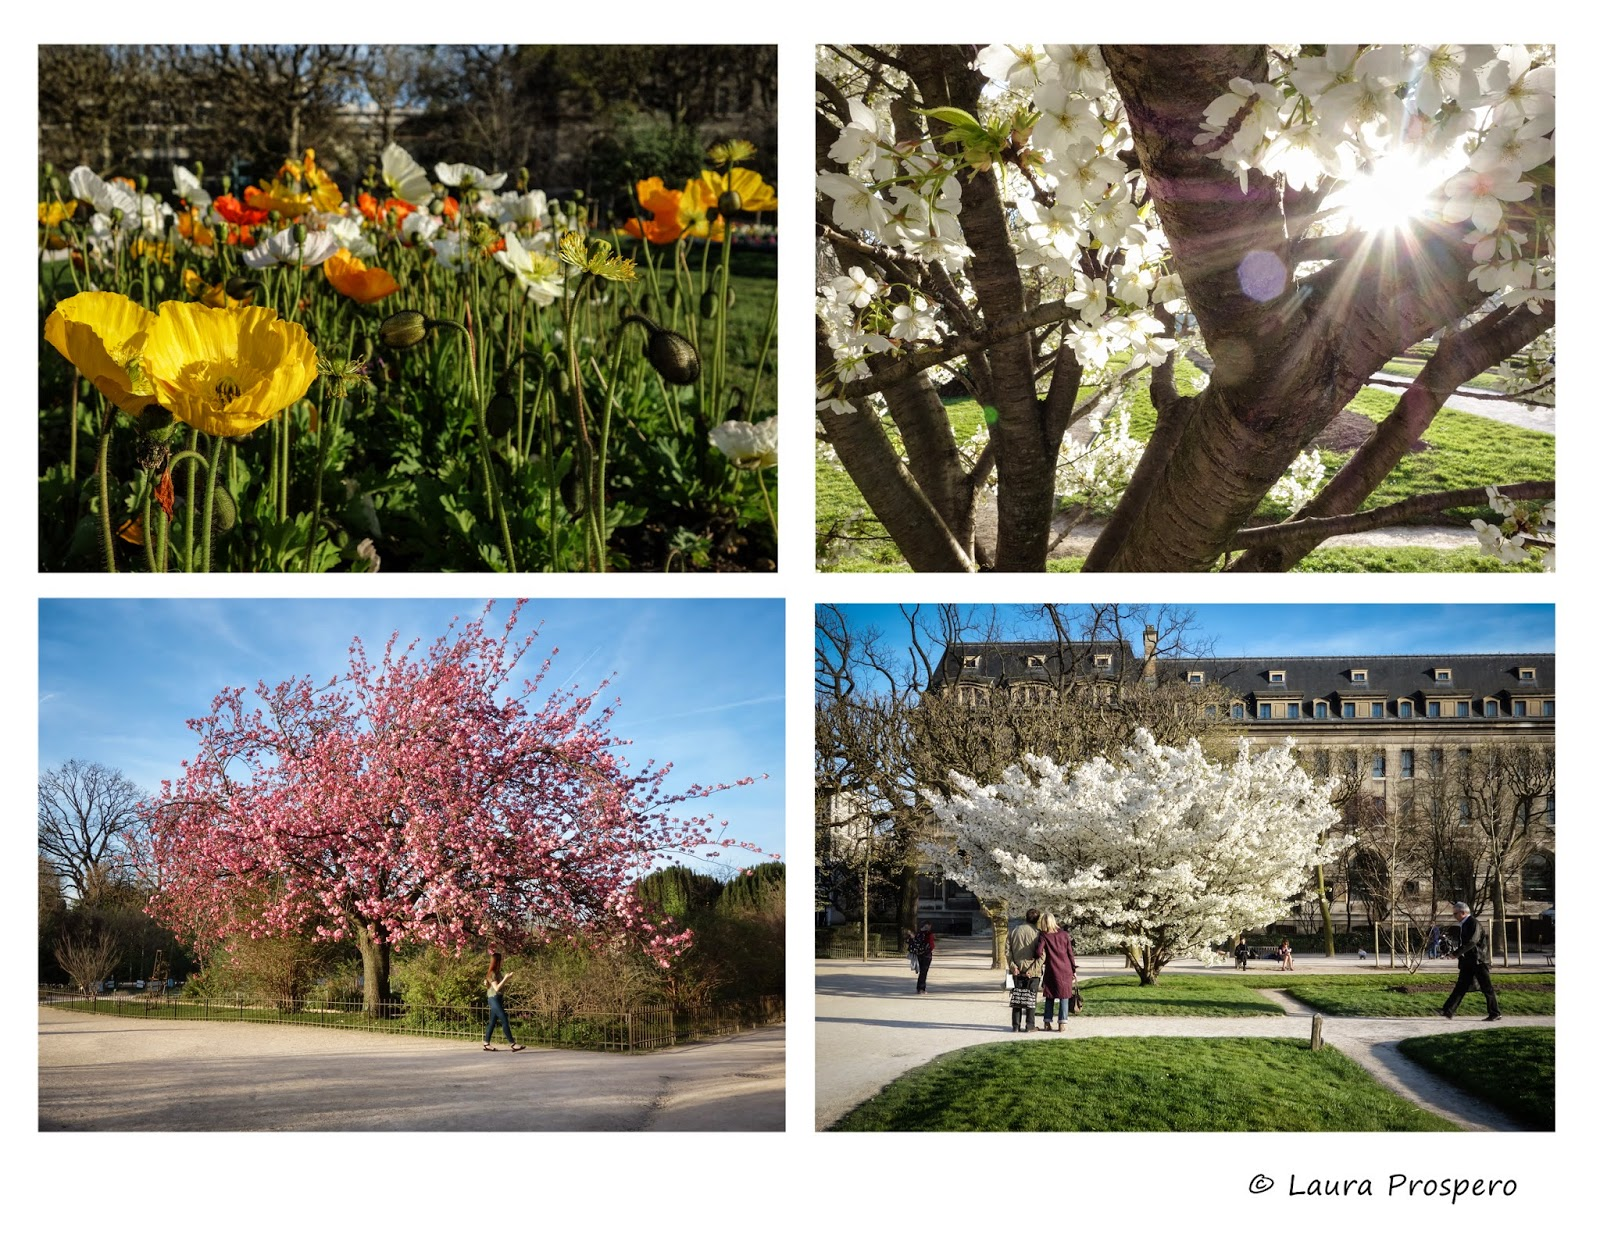 jardin des plantes - paris, avril 2015 © Laura Prospero